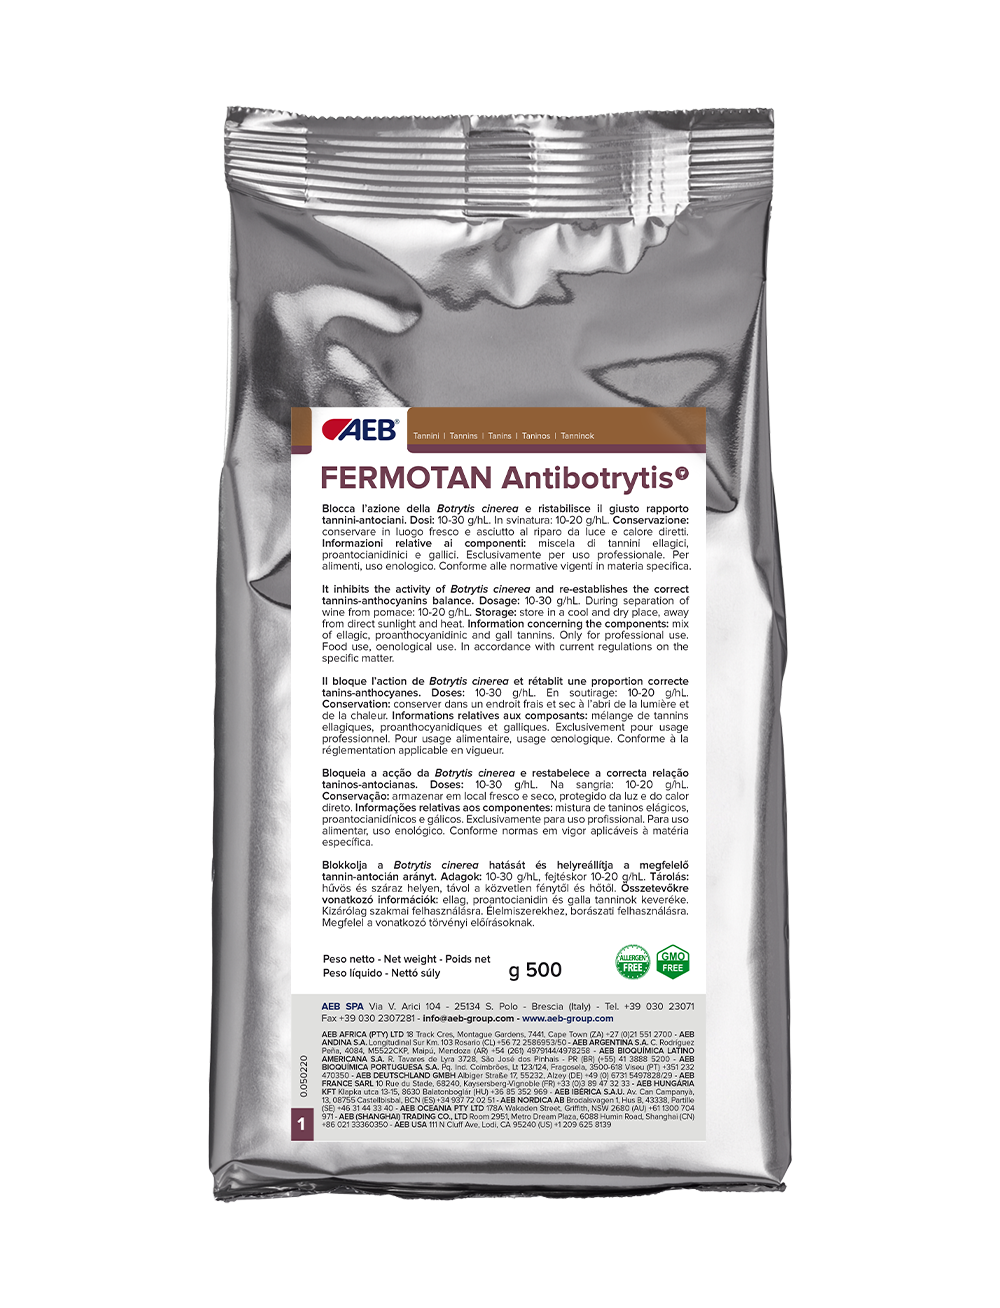 FERMOTAN Antibotrytis